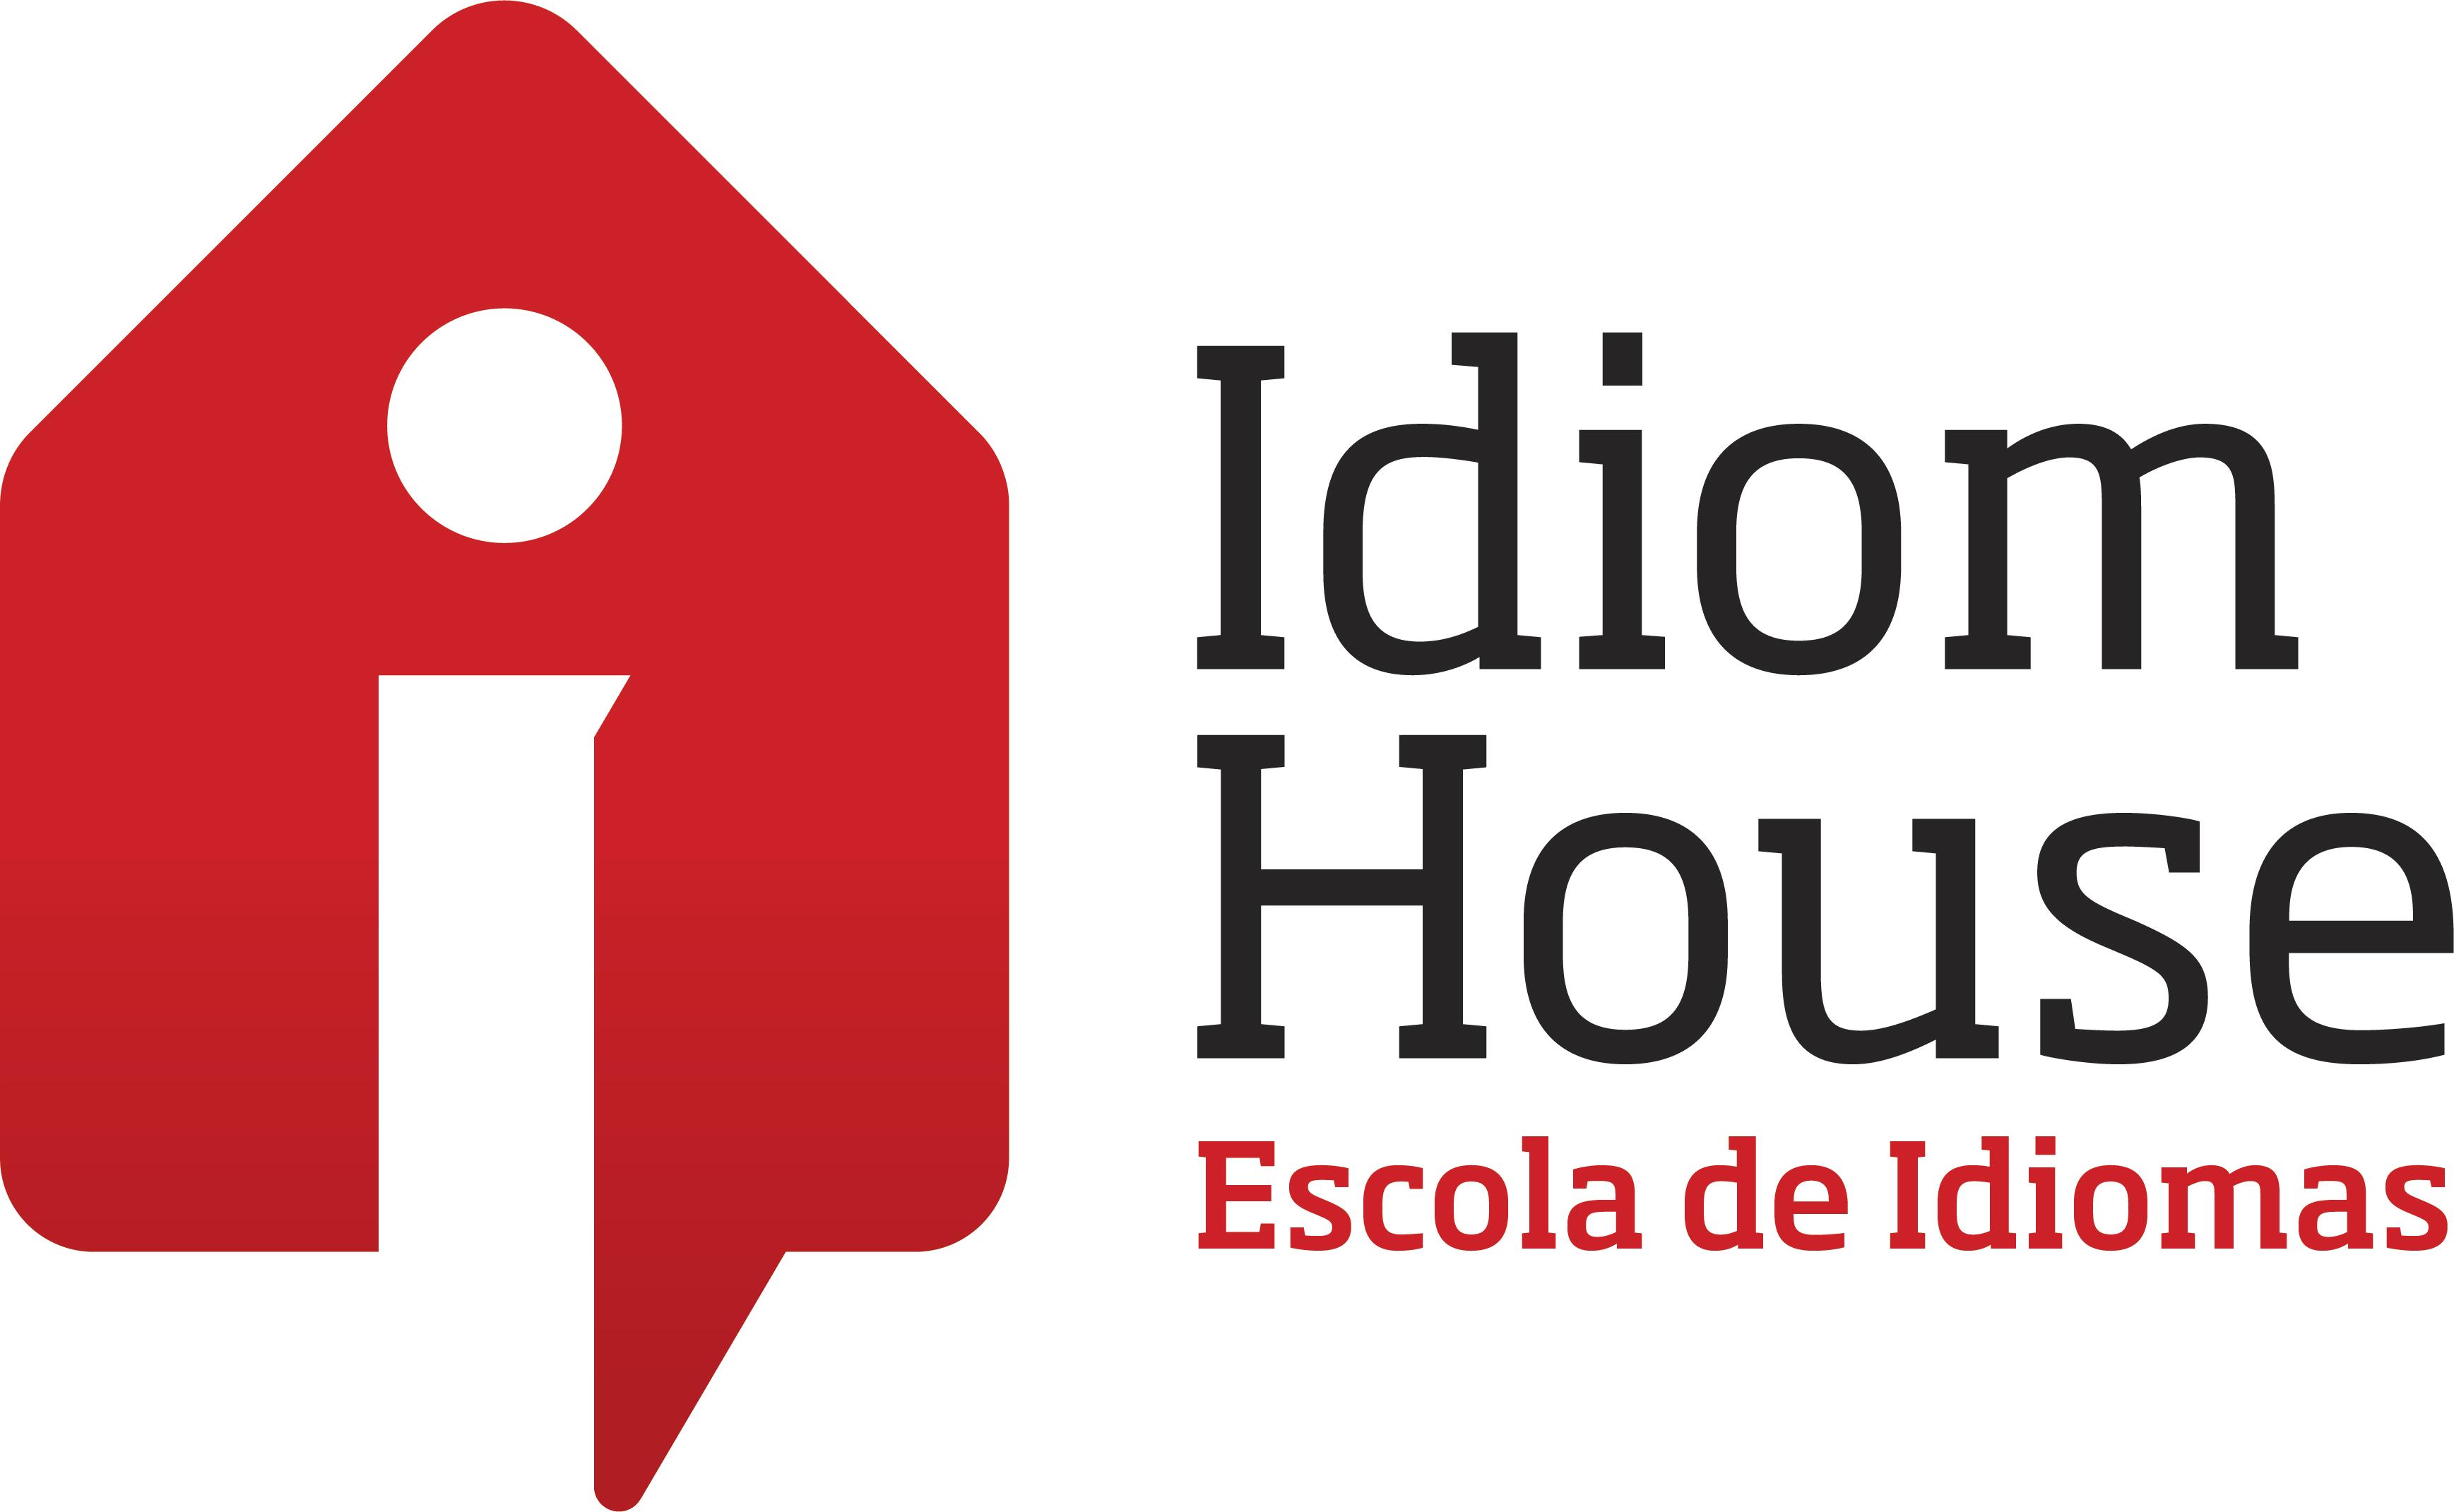 The Idiom House